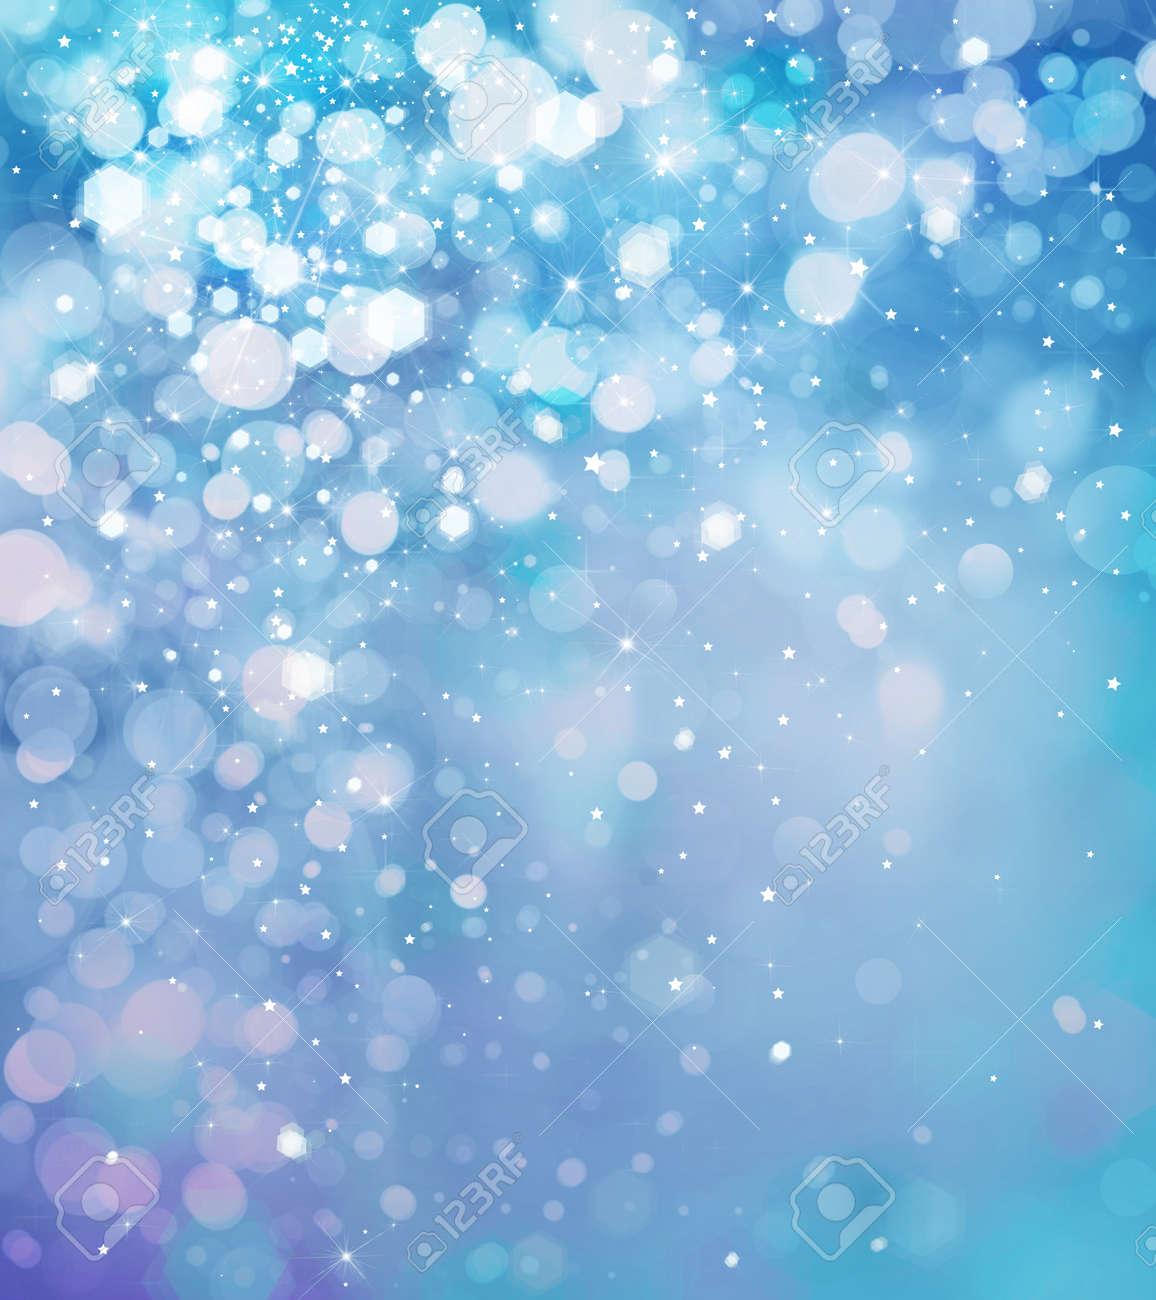 e138ca23c297a Abstract Blue Sparkle